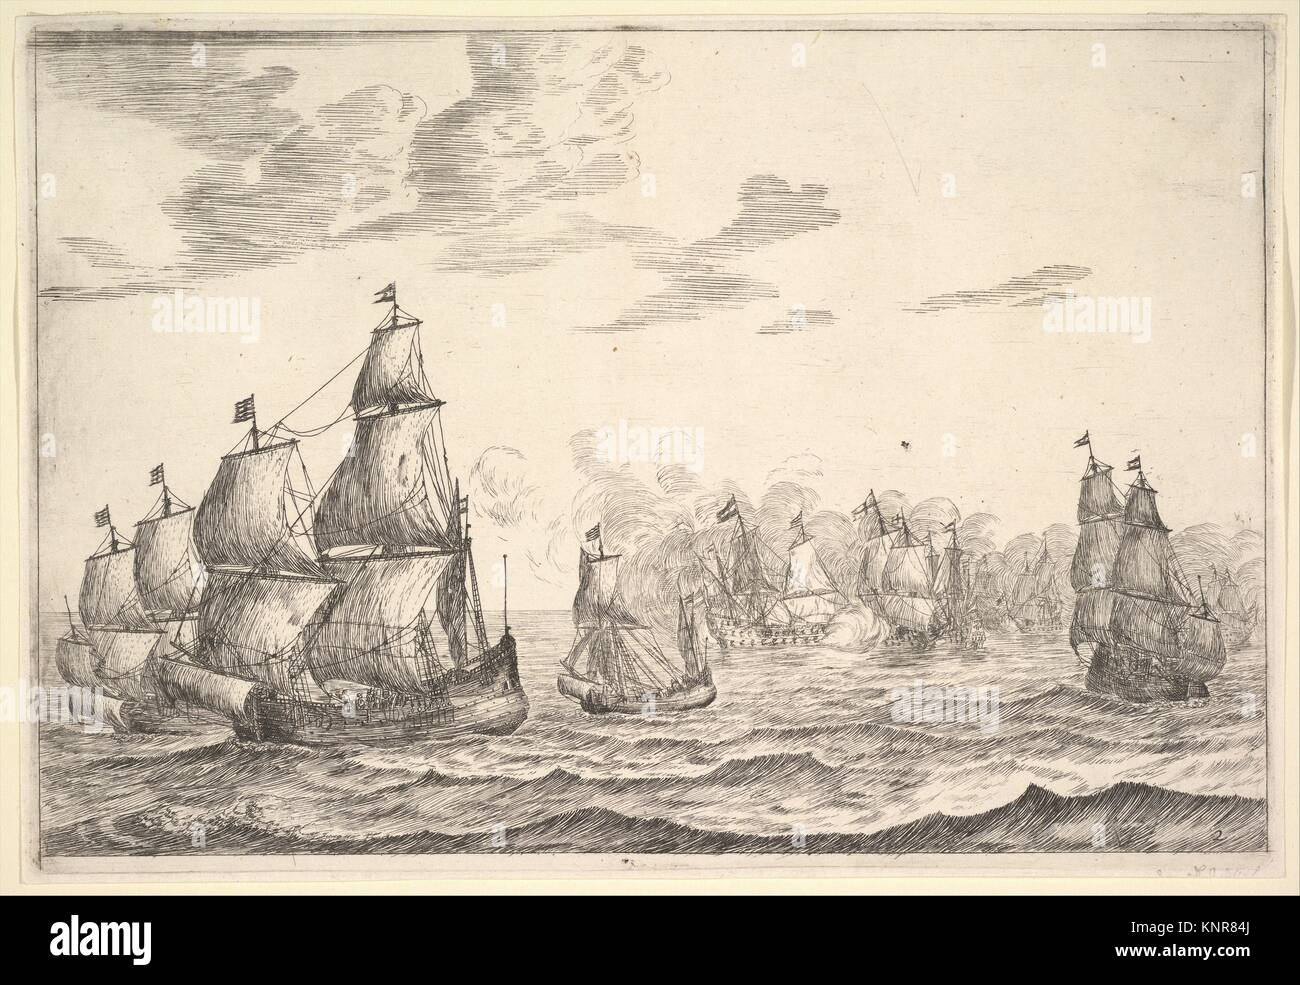 Naval Battle Scene. Artist: Reinier Nooms, called Zeeman (Dutch, Amsterdam ca. 1623-1664 Amsterdam); Date: 17th century; Medium: Etching; Dimensions: Stock Photo